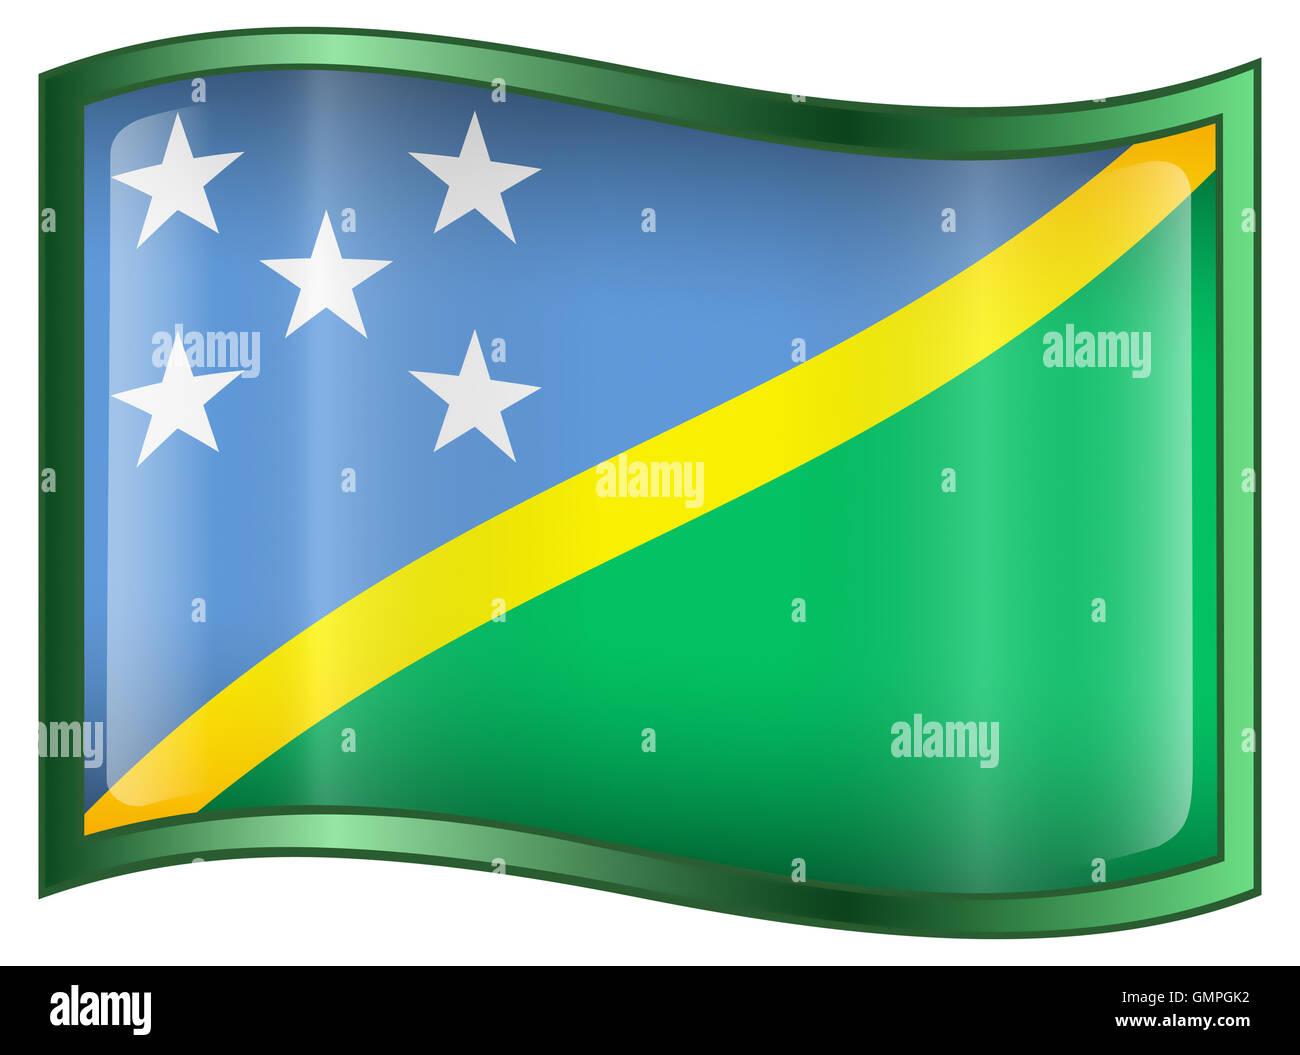 Solomon Islands Flag icon. - Stock Image